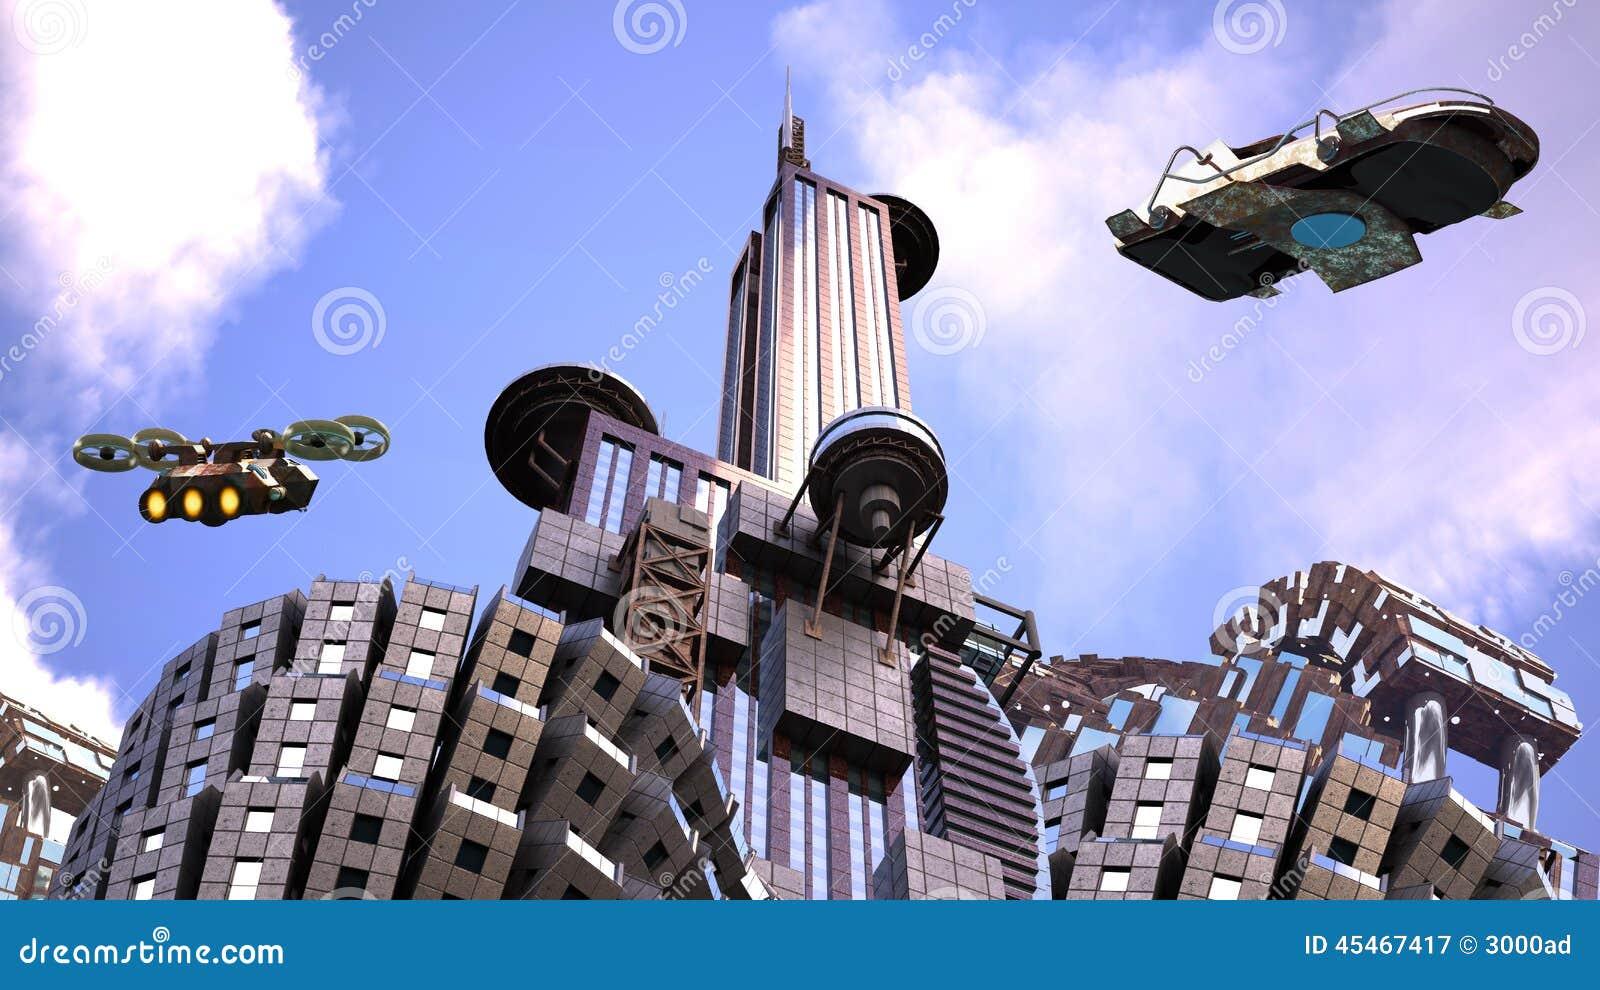 Futuristic city with surveillance drones